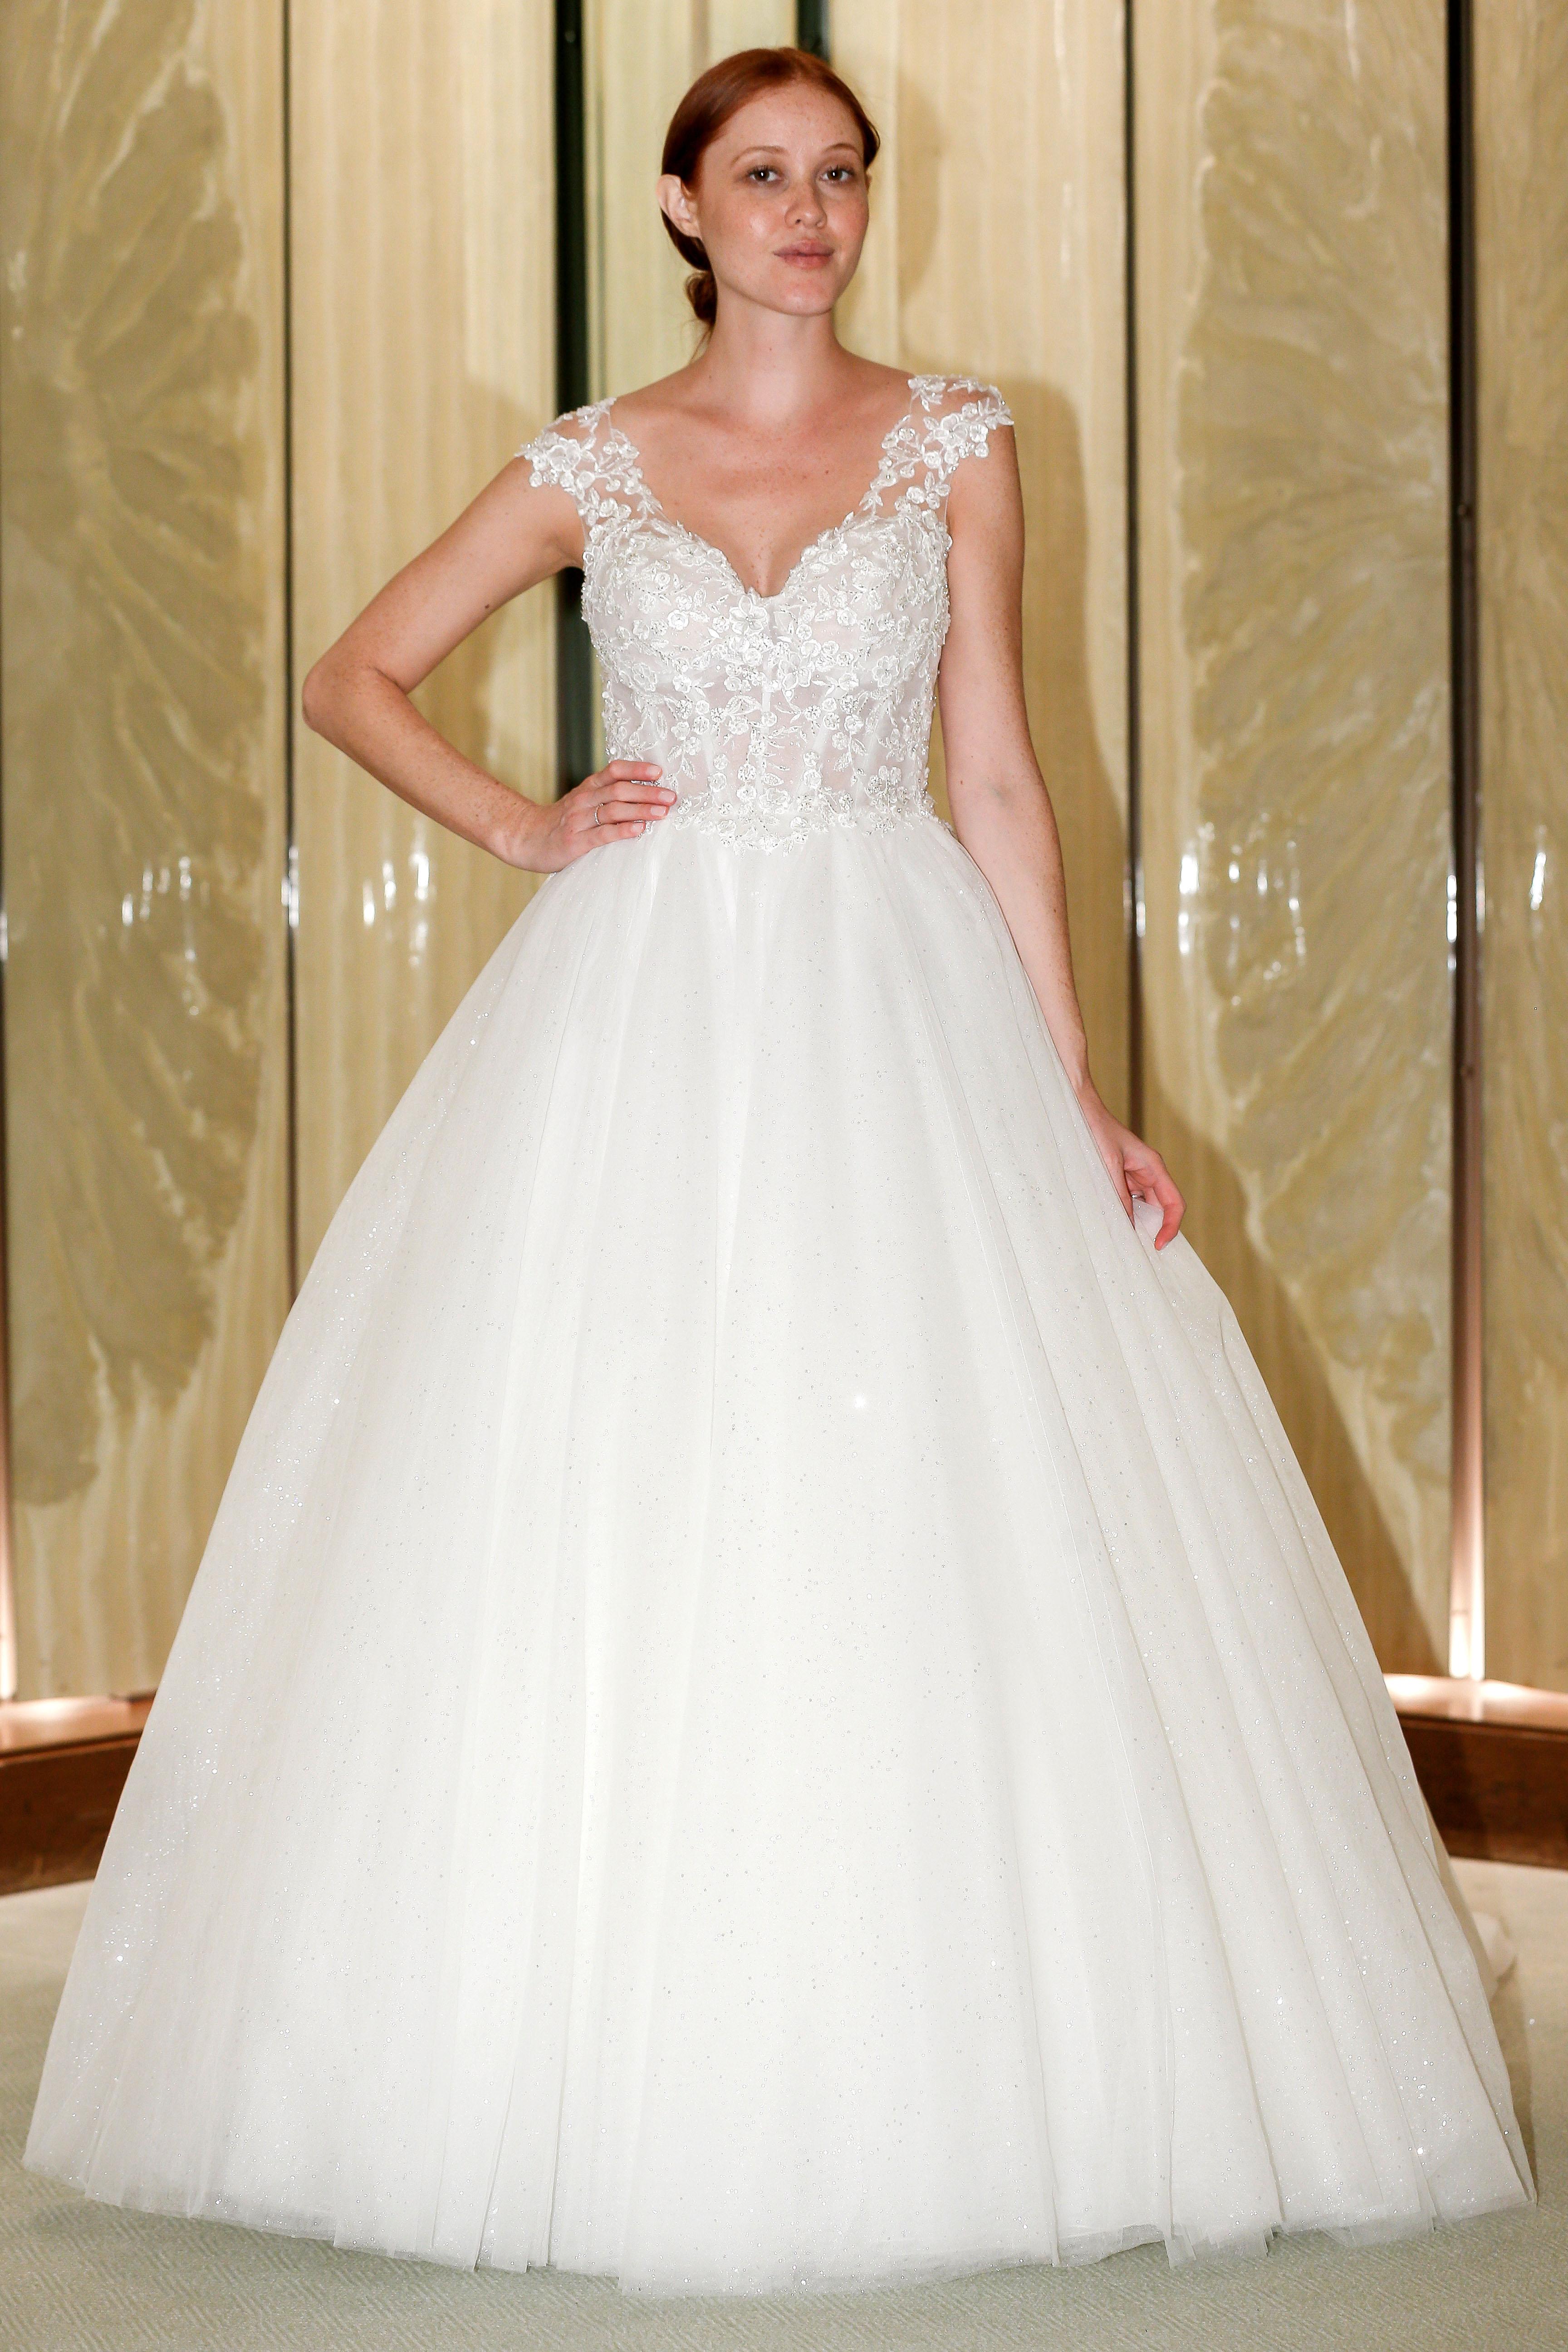 randy fenoli wedding dress lace cap sleeves tulle ball gown